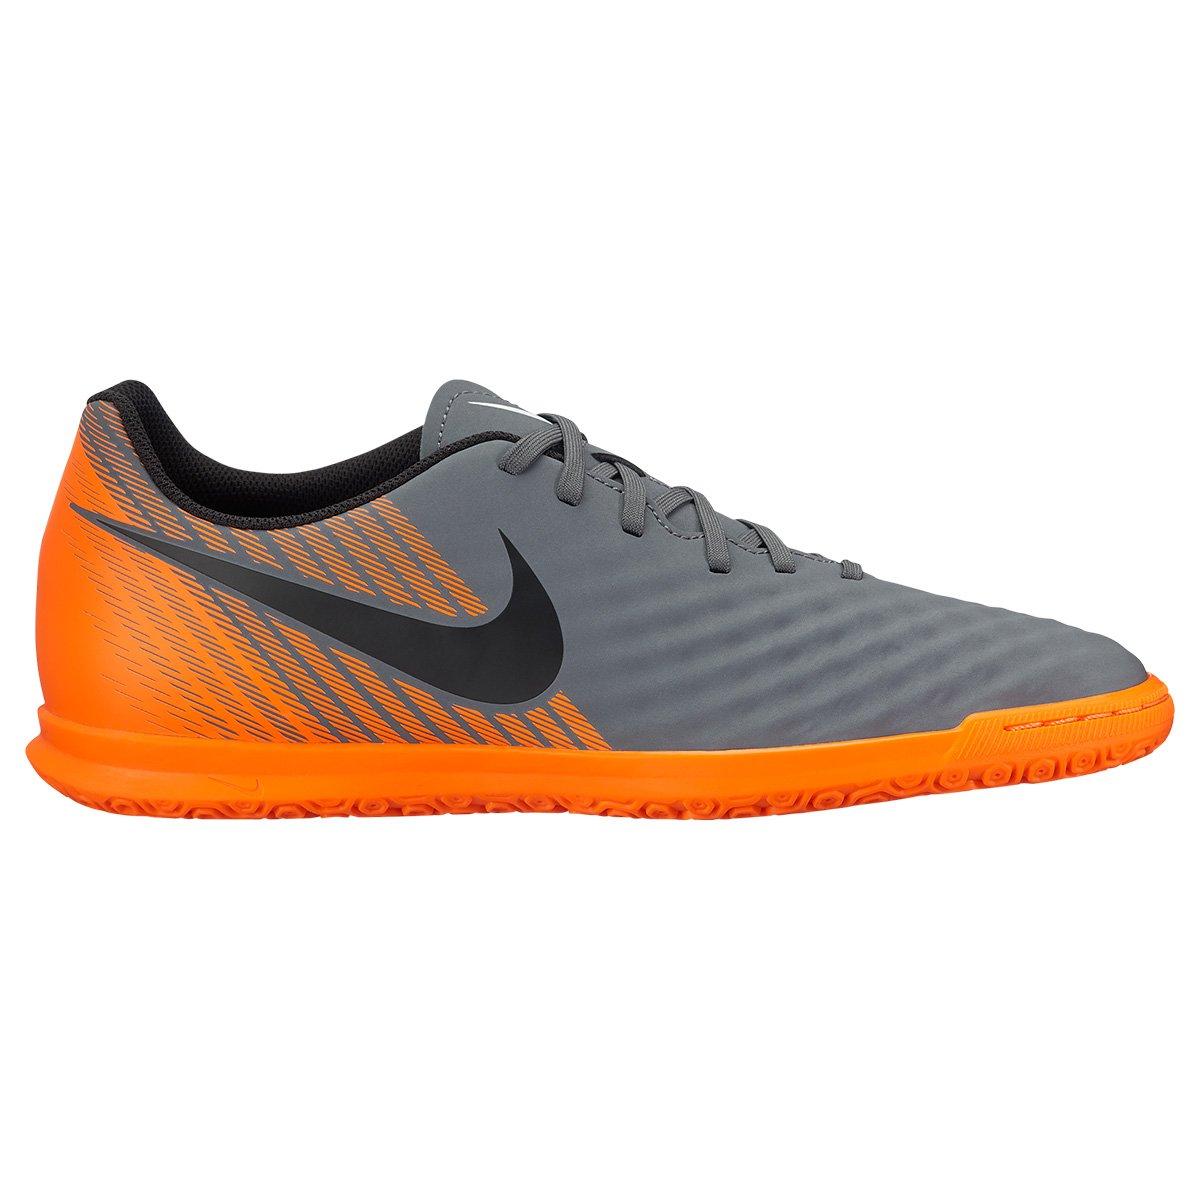 27203194a6 Chuteira Futsal Nike Magista Obra 2 Club IC Masculina